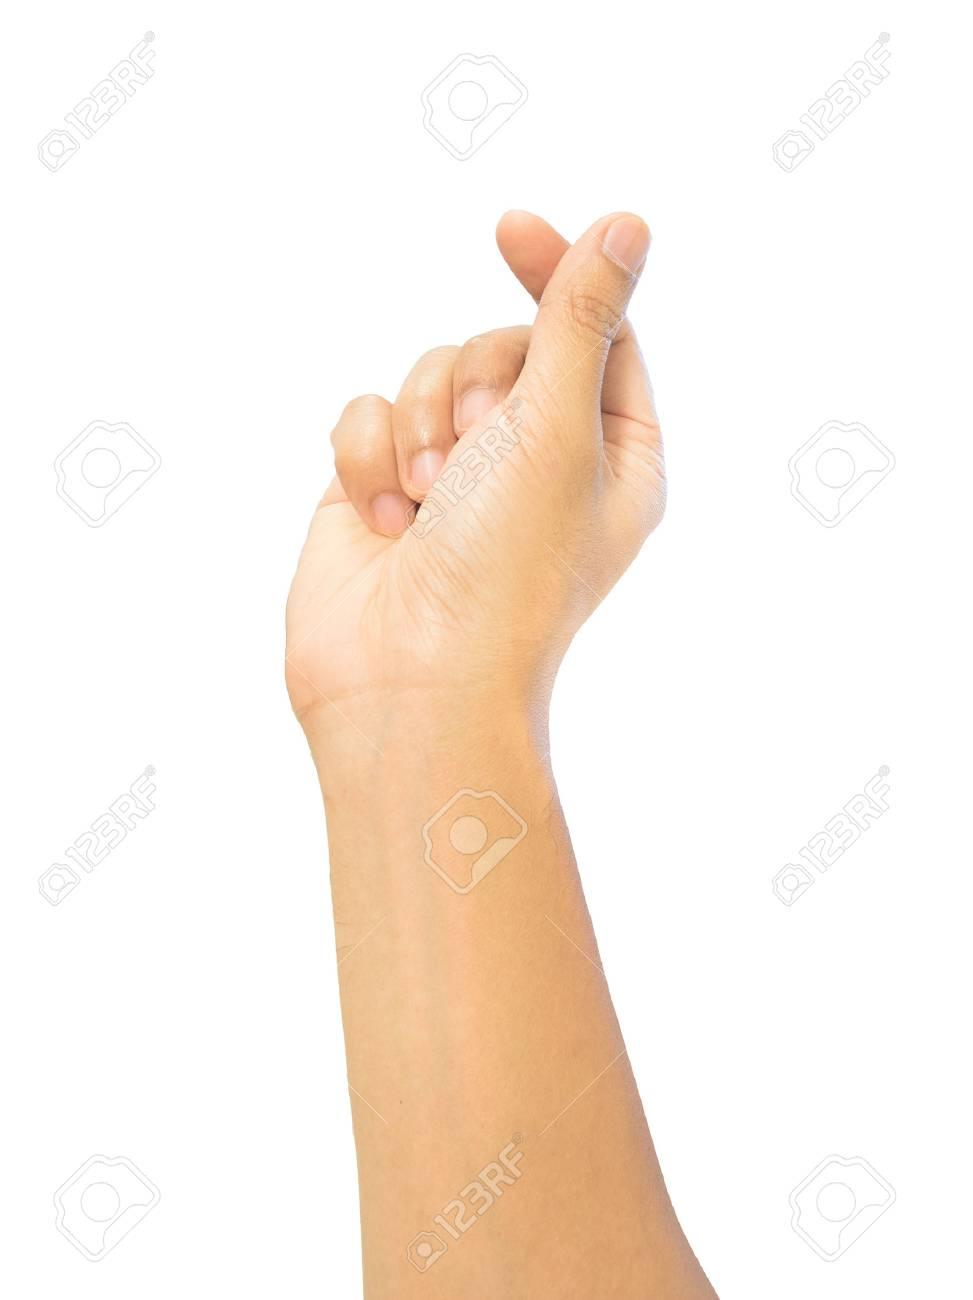 Mini heart finger hand sign love symbol trend posture isolation mini heart finger hand sign love symbol trend posture isolation with clipping path biocorpaavc Gallery